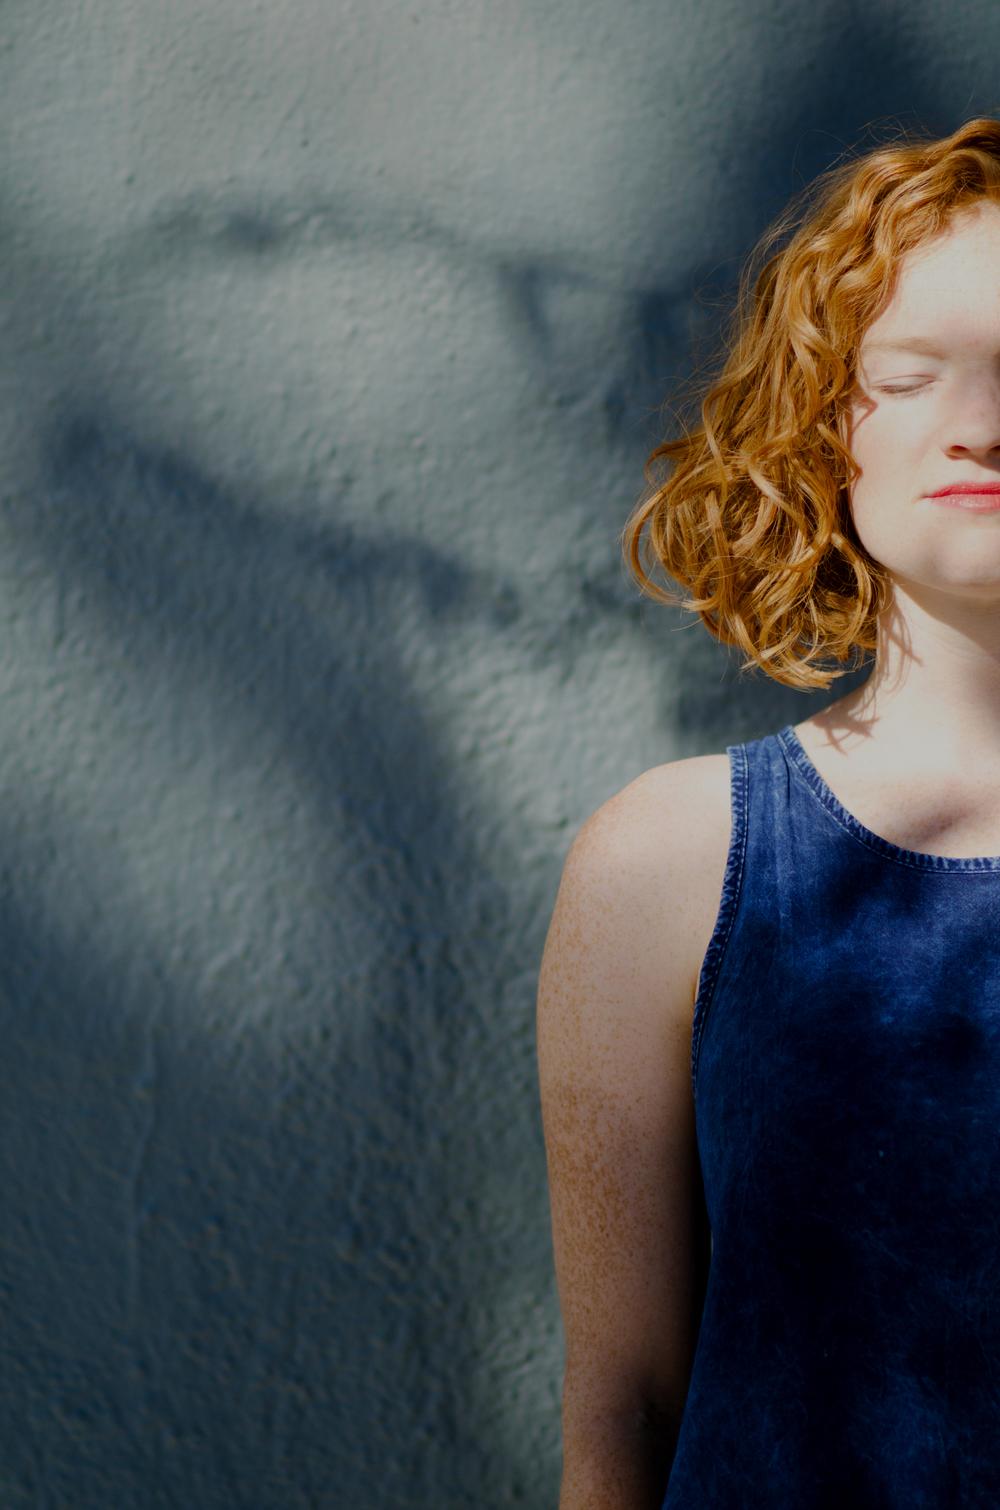 SILVERLAKE LOS ANGELES PORTRAIT PHOTOGRAPHER